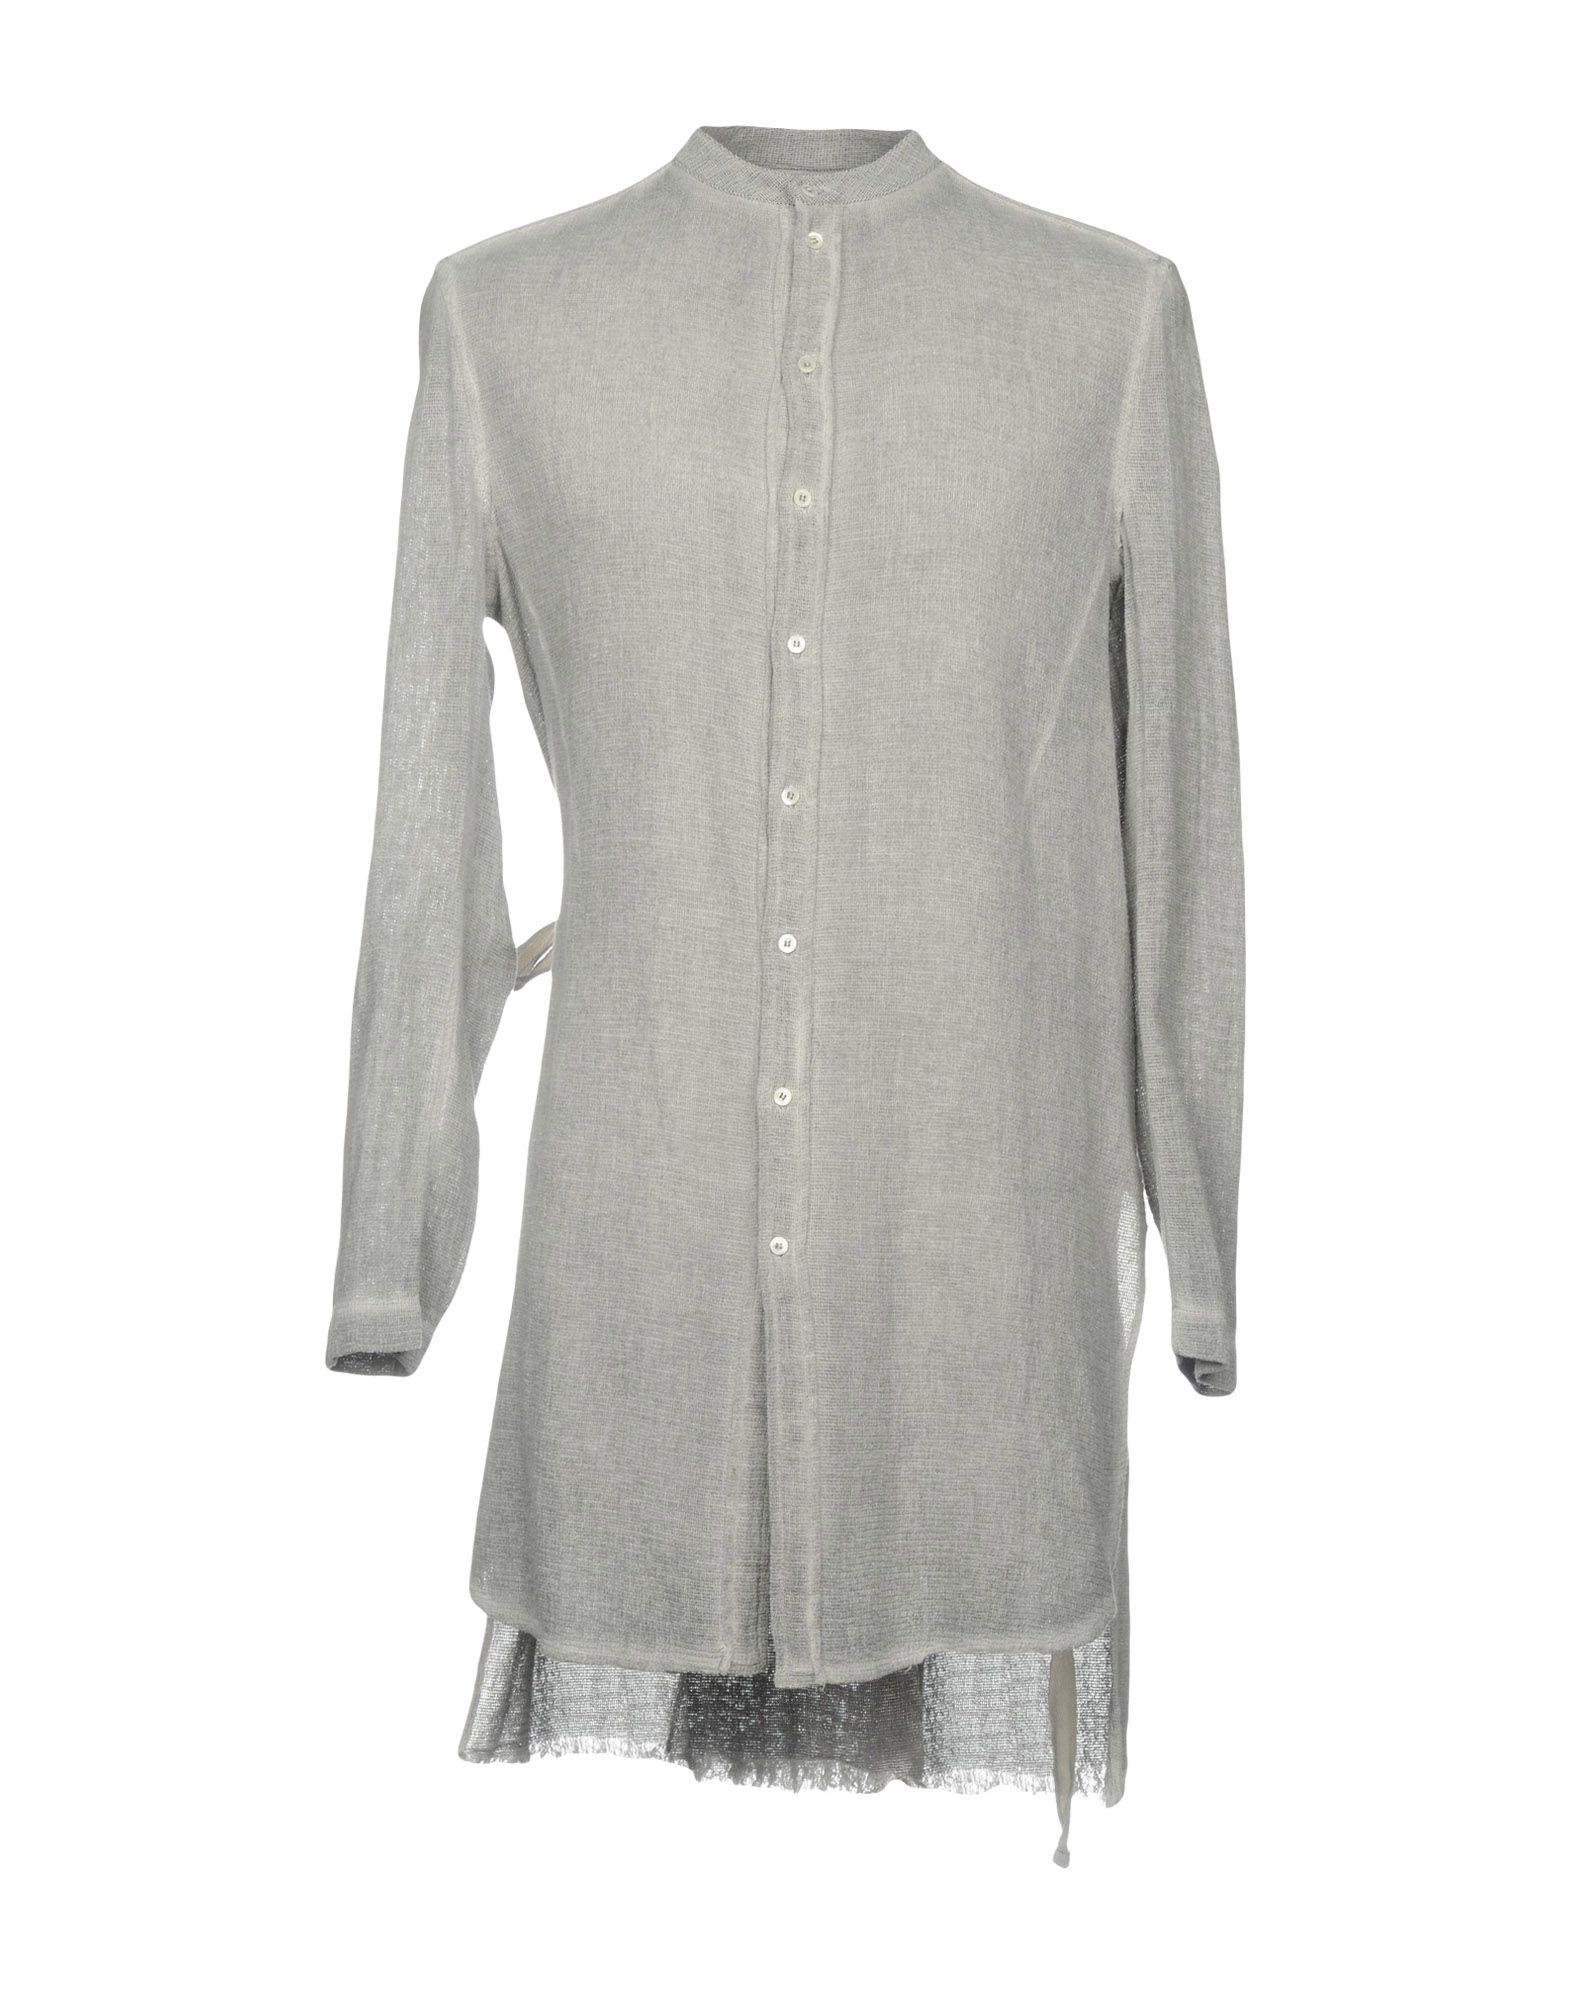 Camicia Tinta Unita Tom Rebl Uomo - Acquista online su